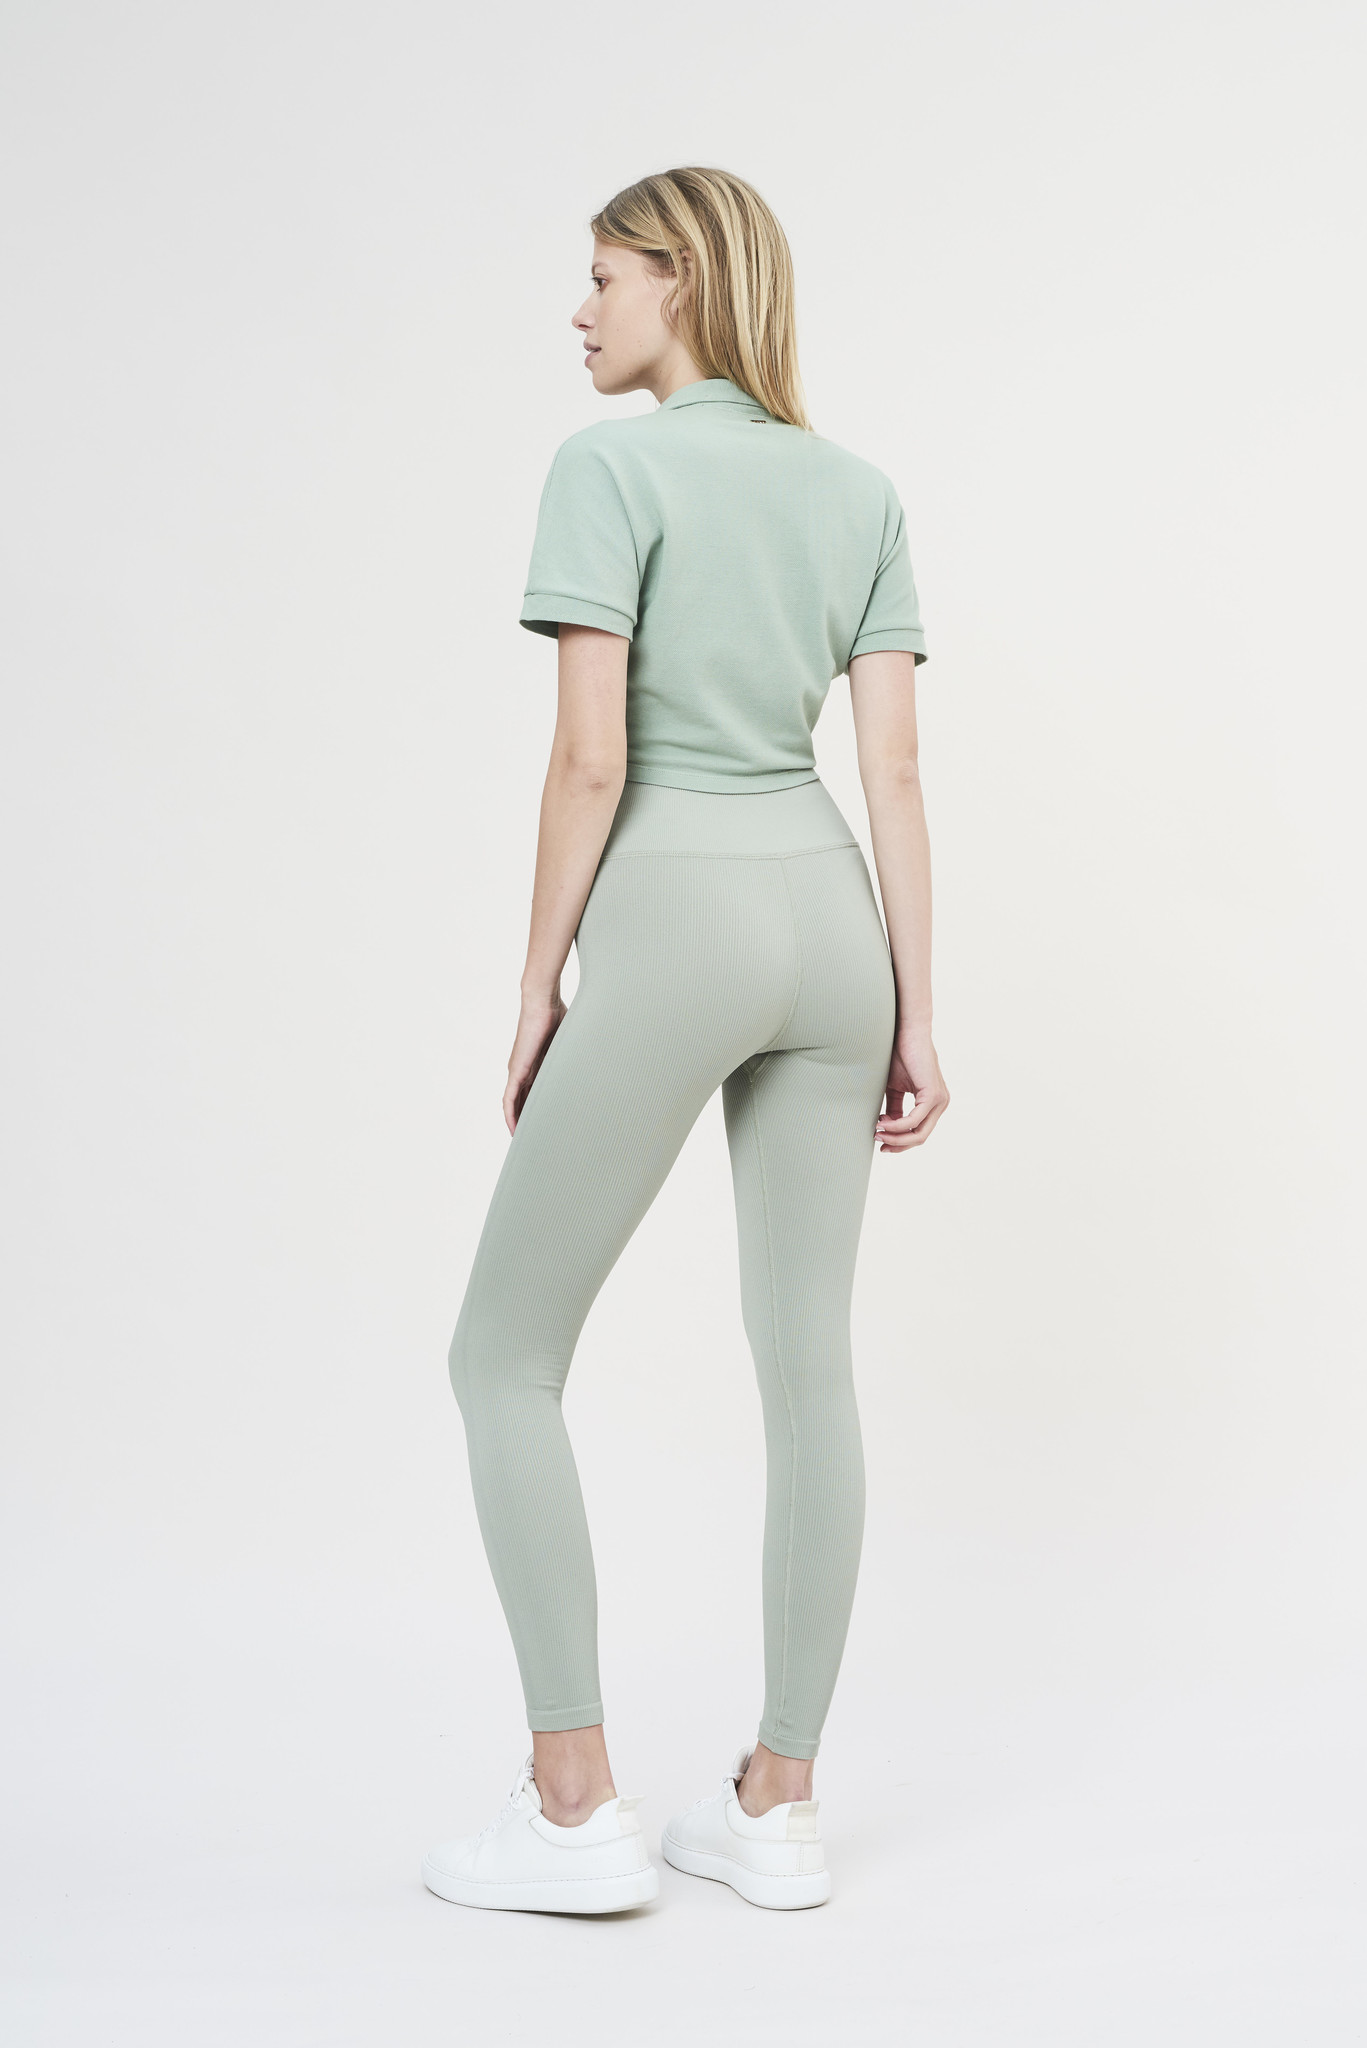 Luna Rib Legging - Sage-4